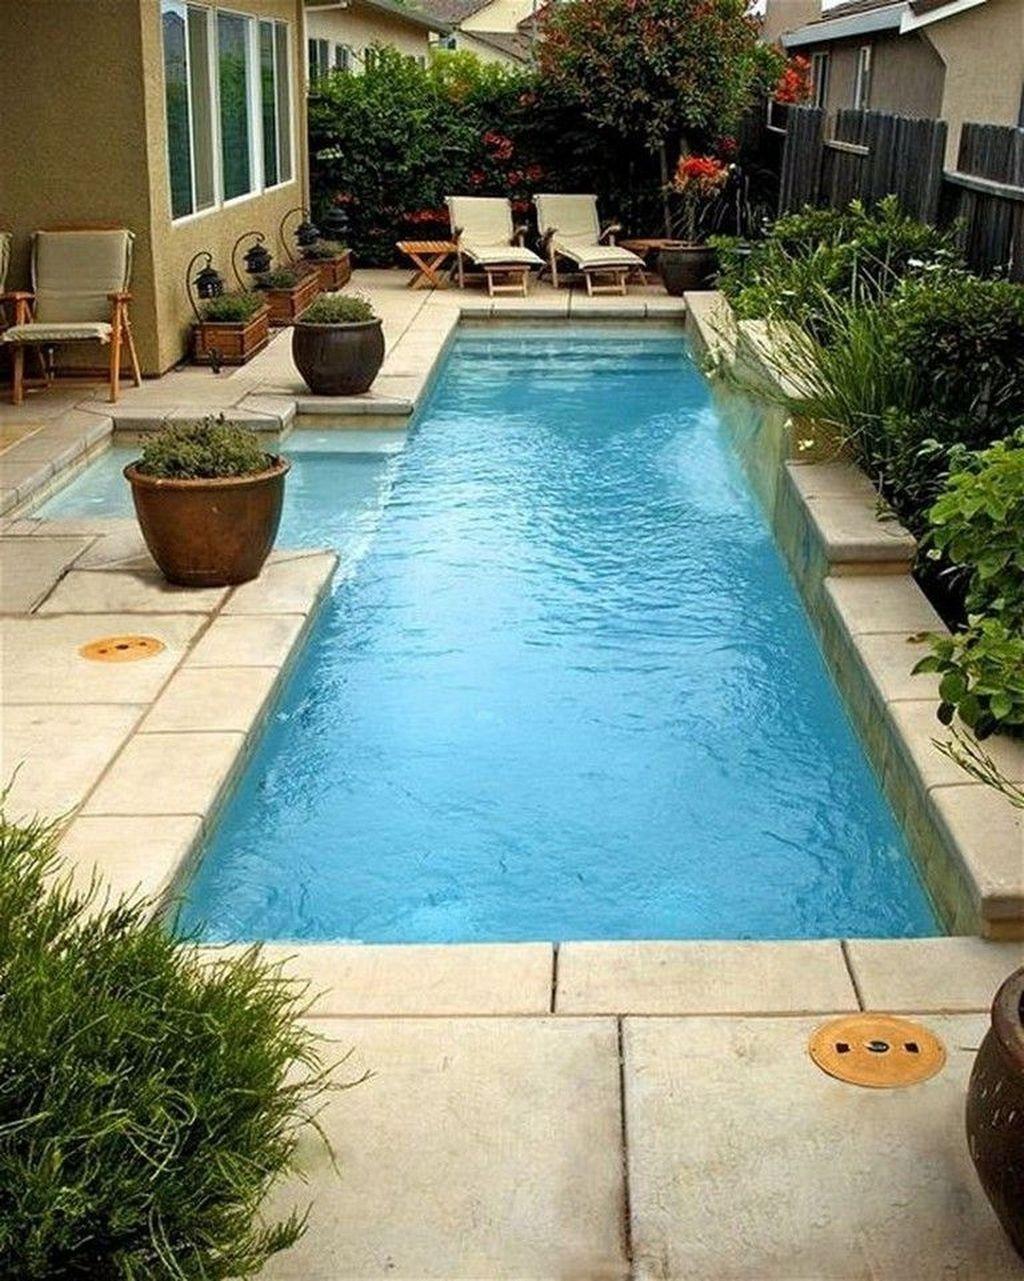 30 Creative Small Pool Design Ideas For Backyard Small Pool Design Small Backyard Pools Swimming Pools Backyard